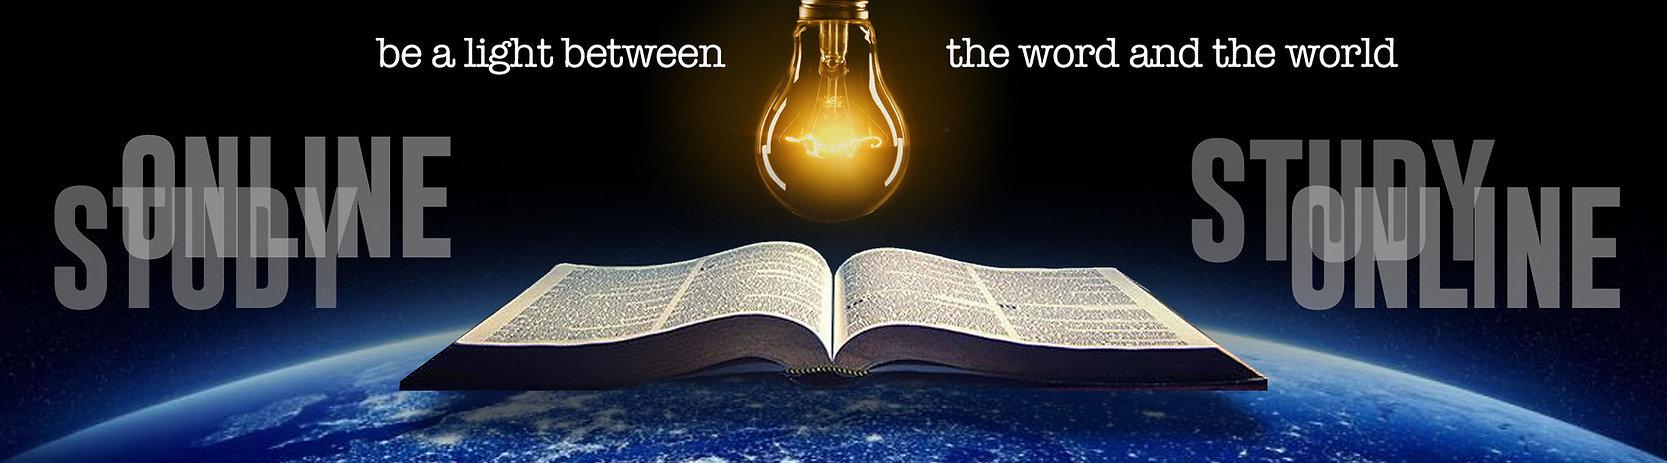 Bible Study Banner-02.jpg